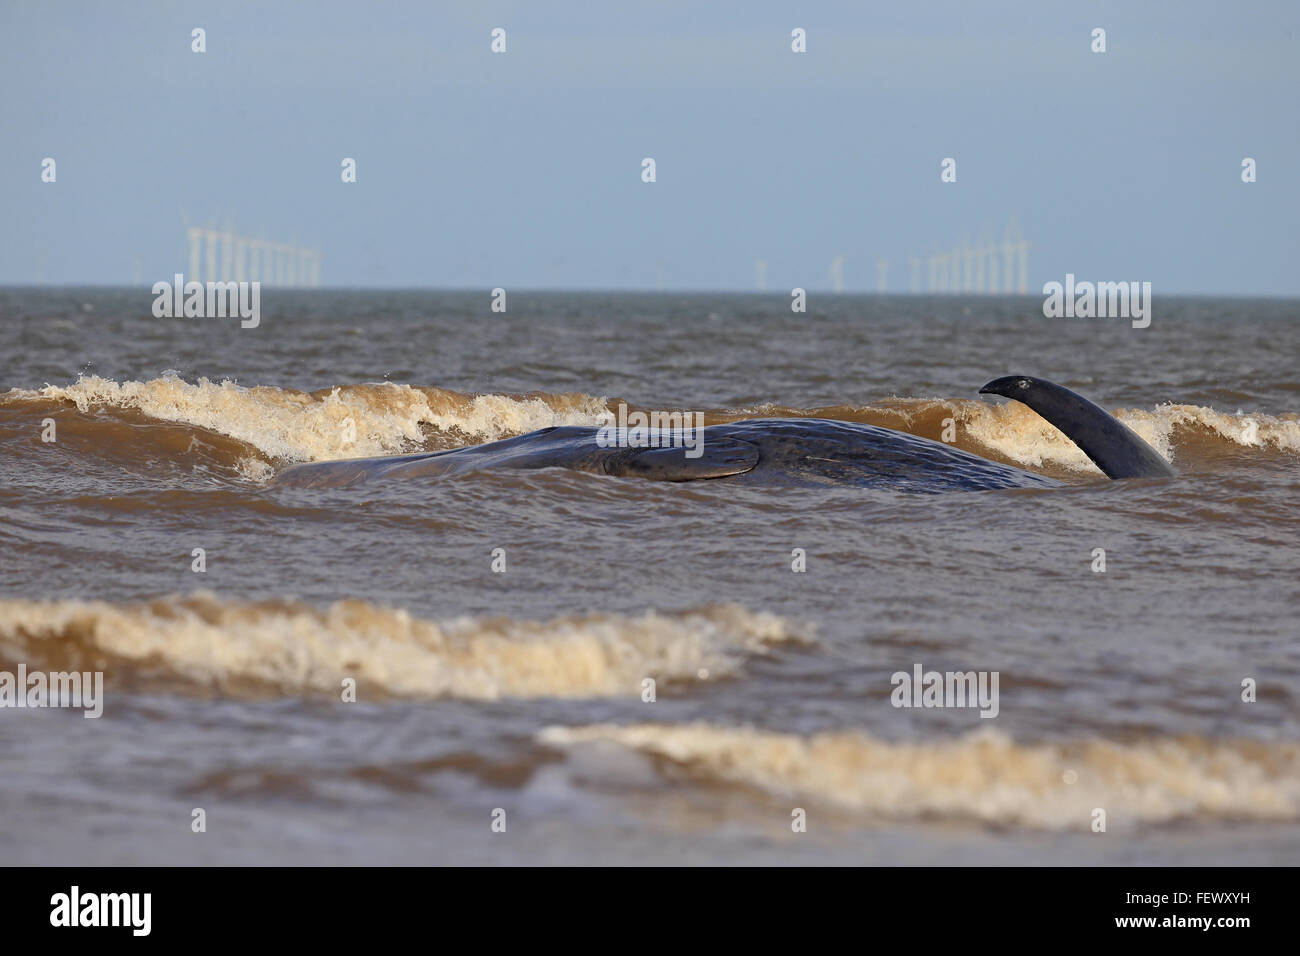 Sperm Whale (Physeter macrocephalus) - Stock Image